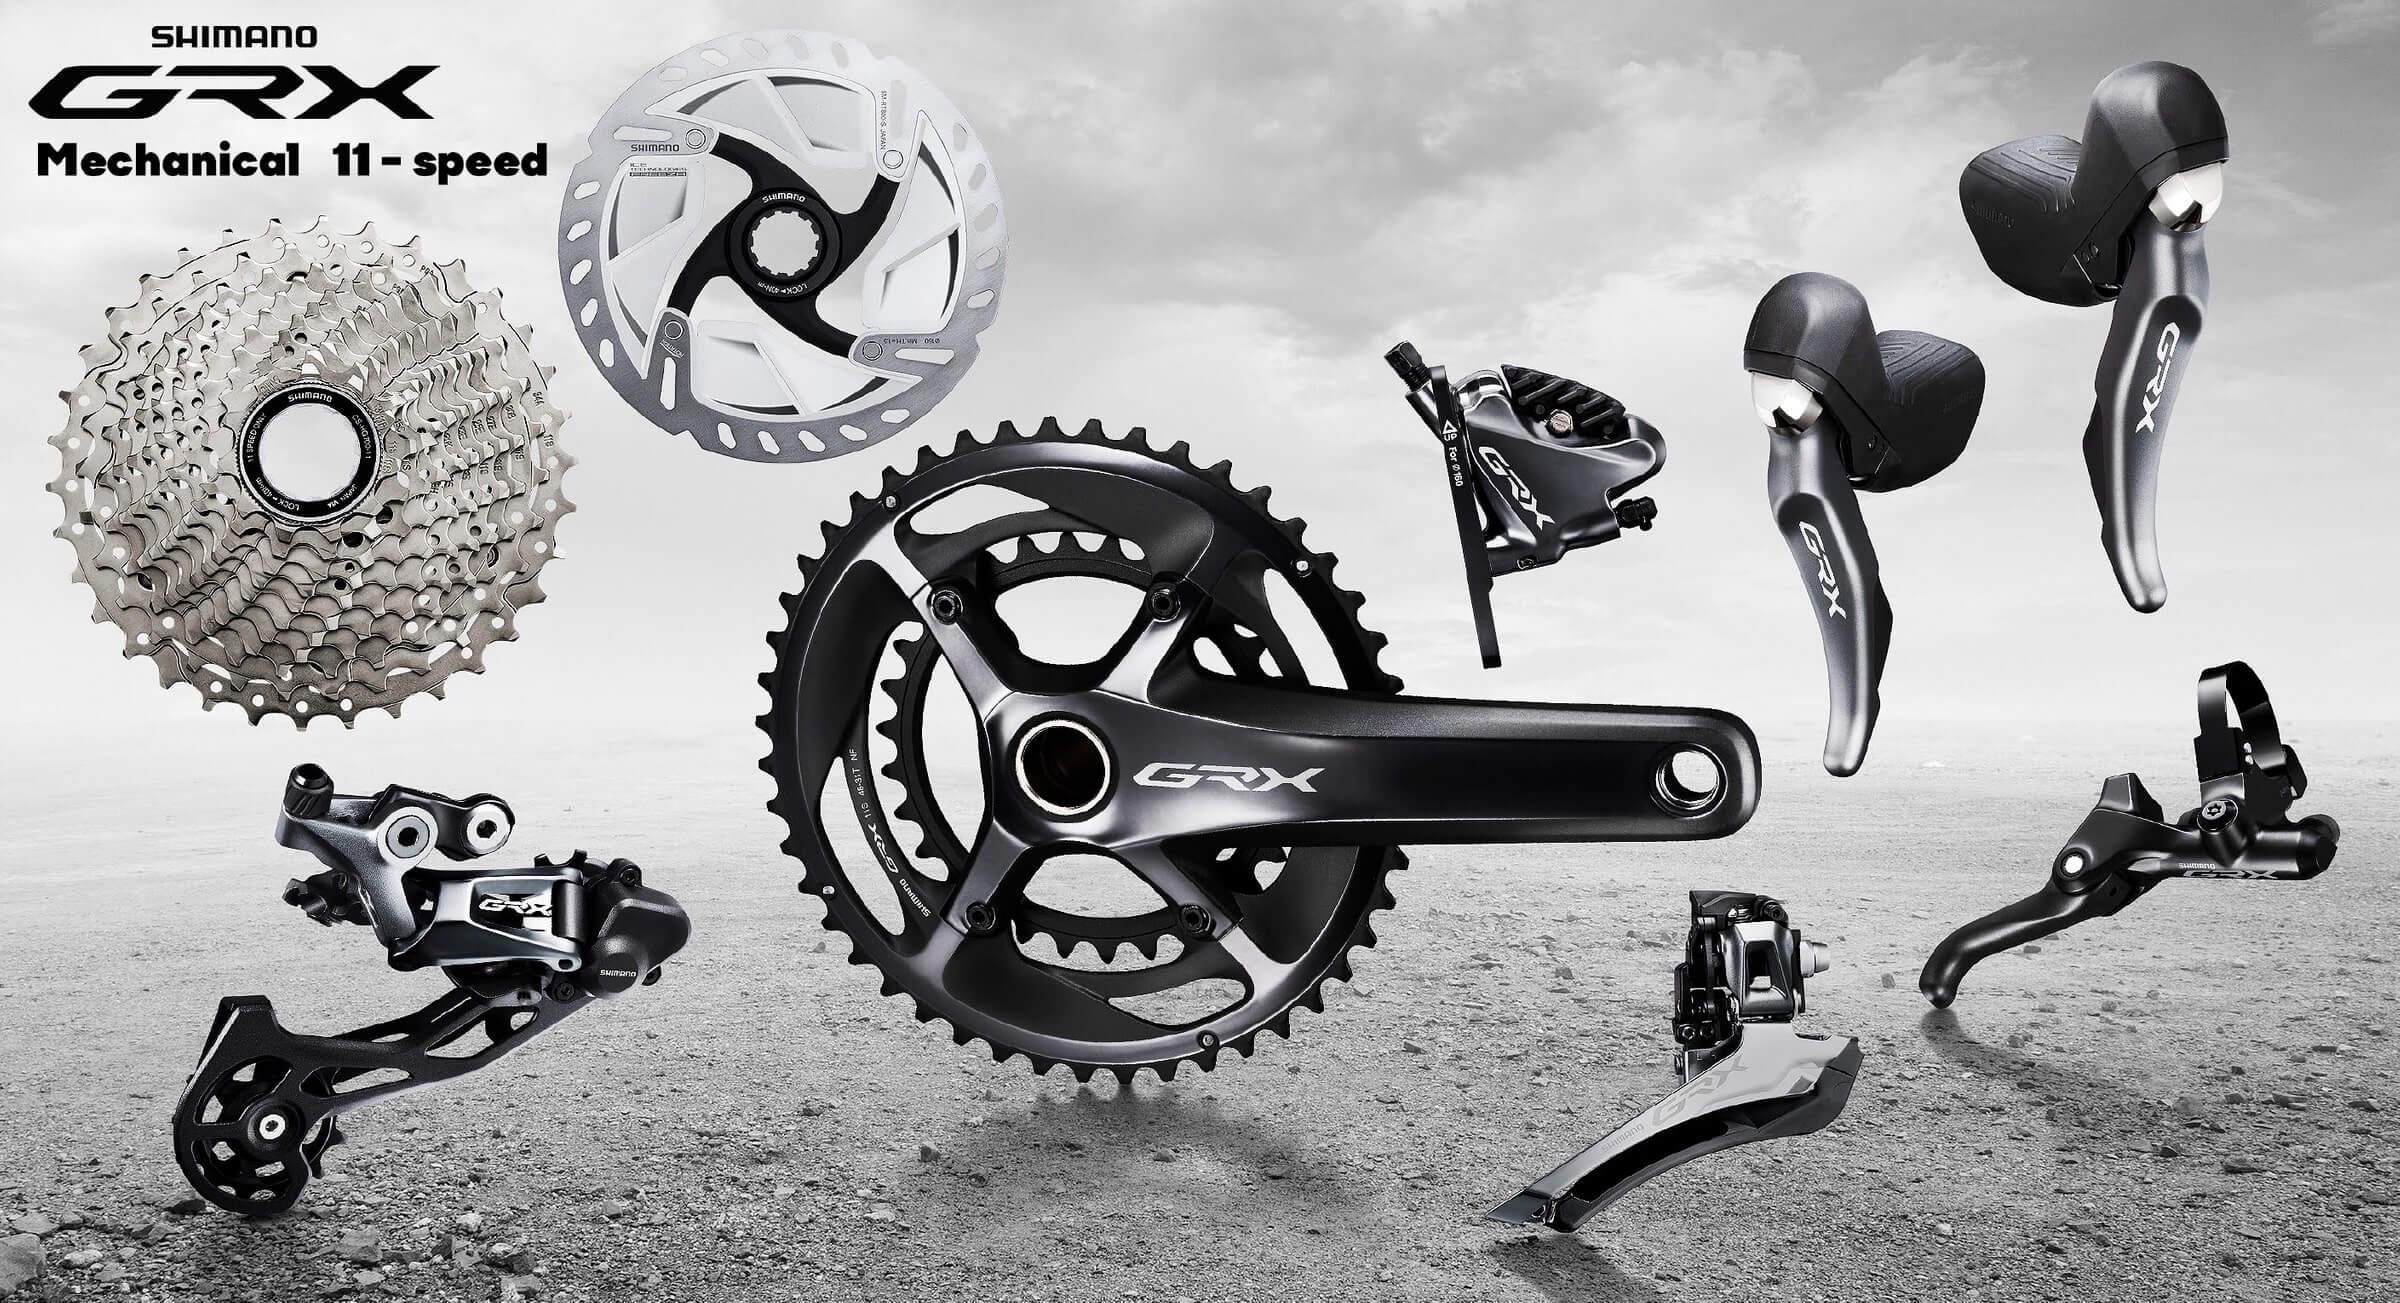 Shimano GRX - 1x11, 2x11, 2x10 Dedicated group for Gravel bikes